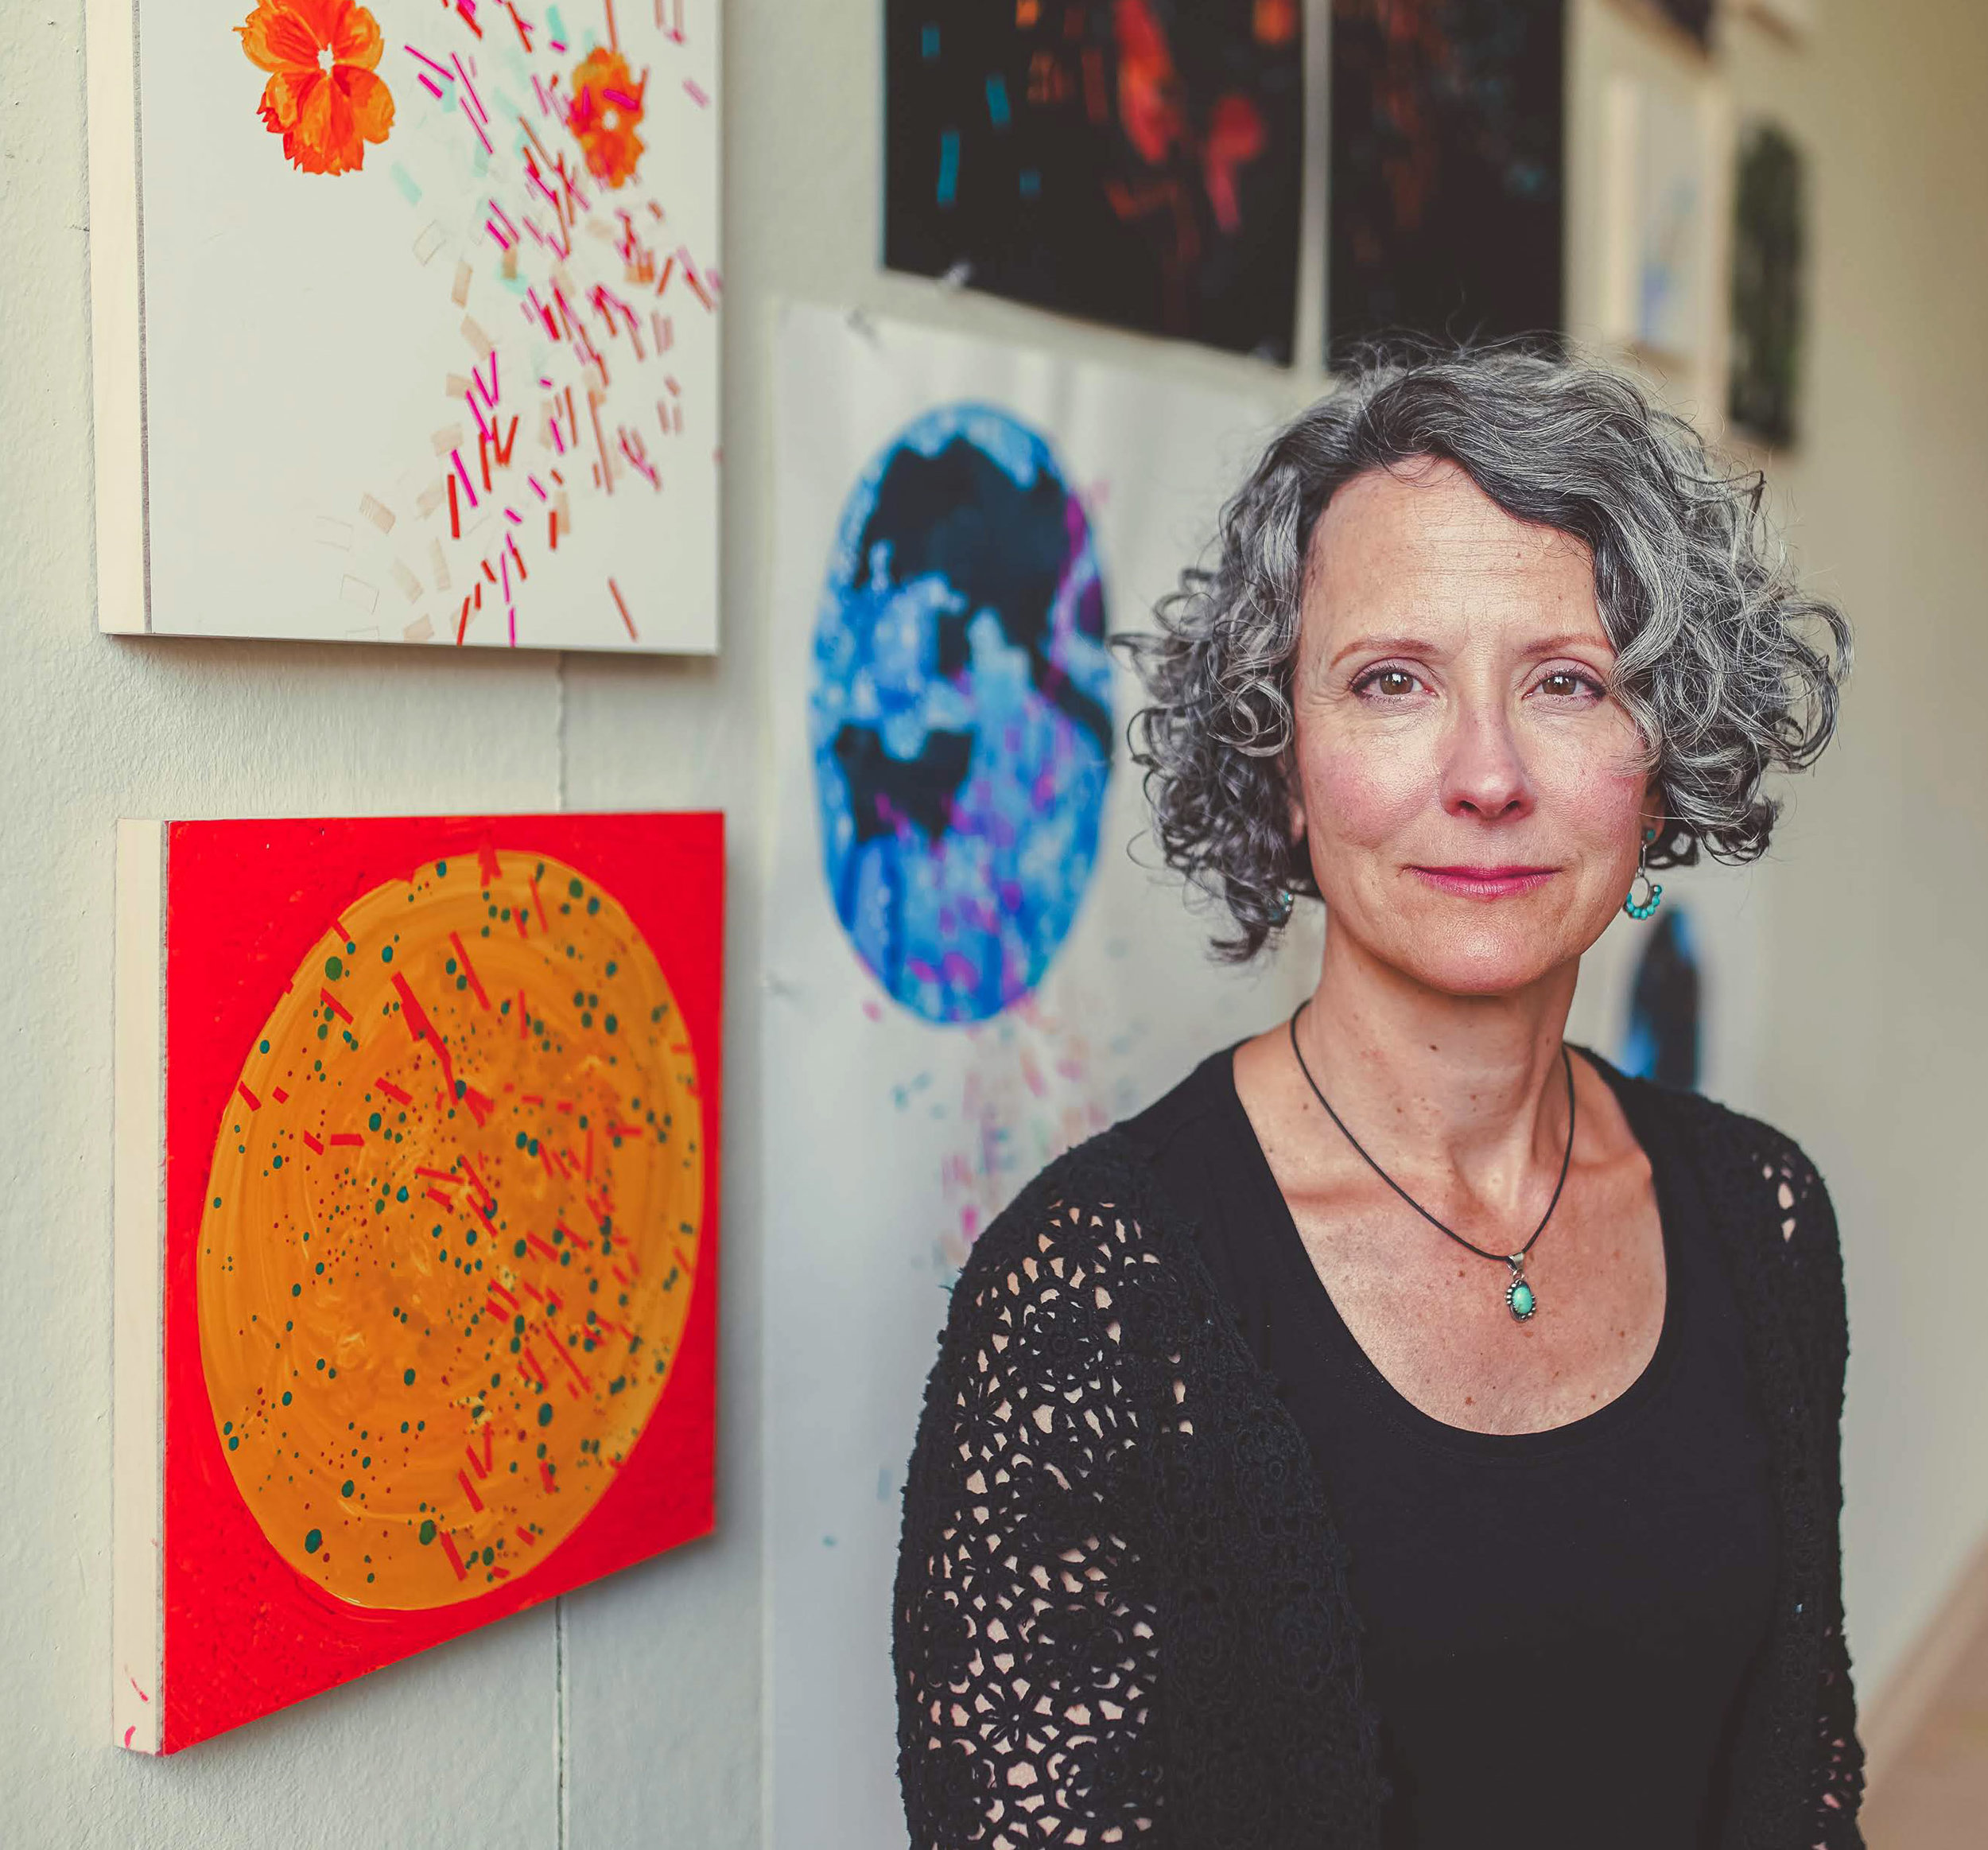 Photograph of Deirdre Murphy at Esther Klein Gallery by Blake Reisenfeld